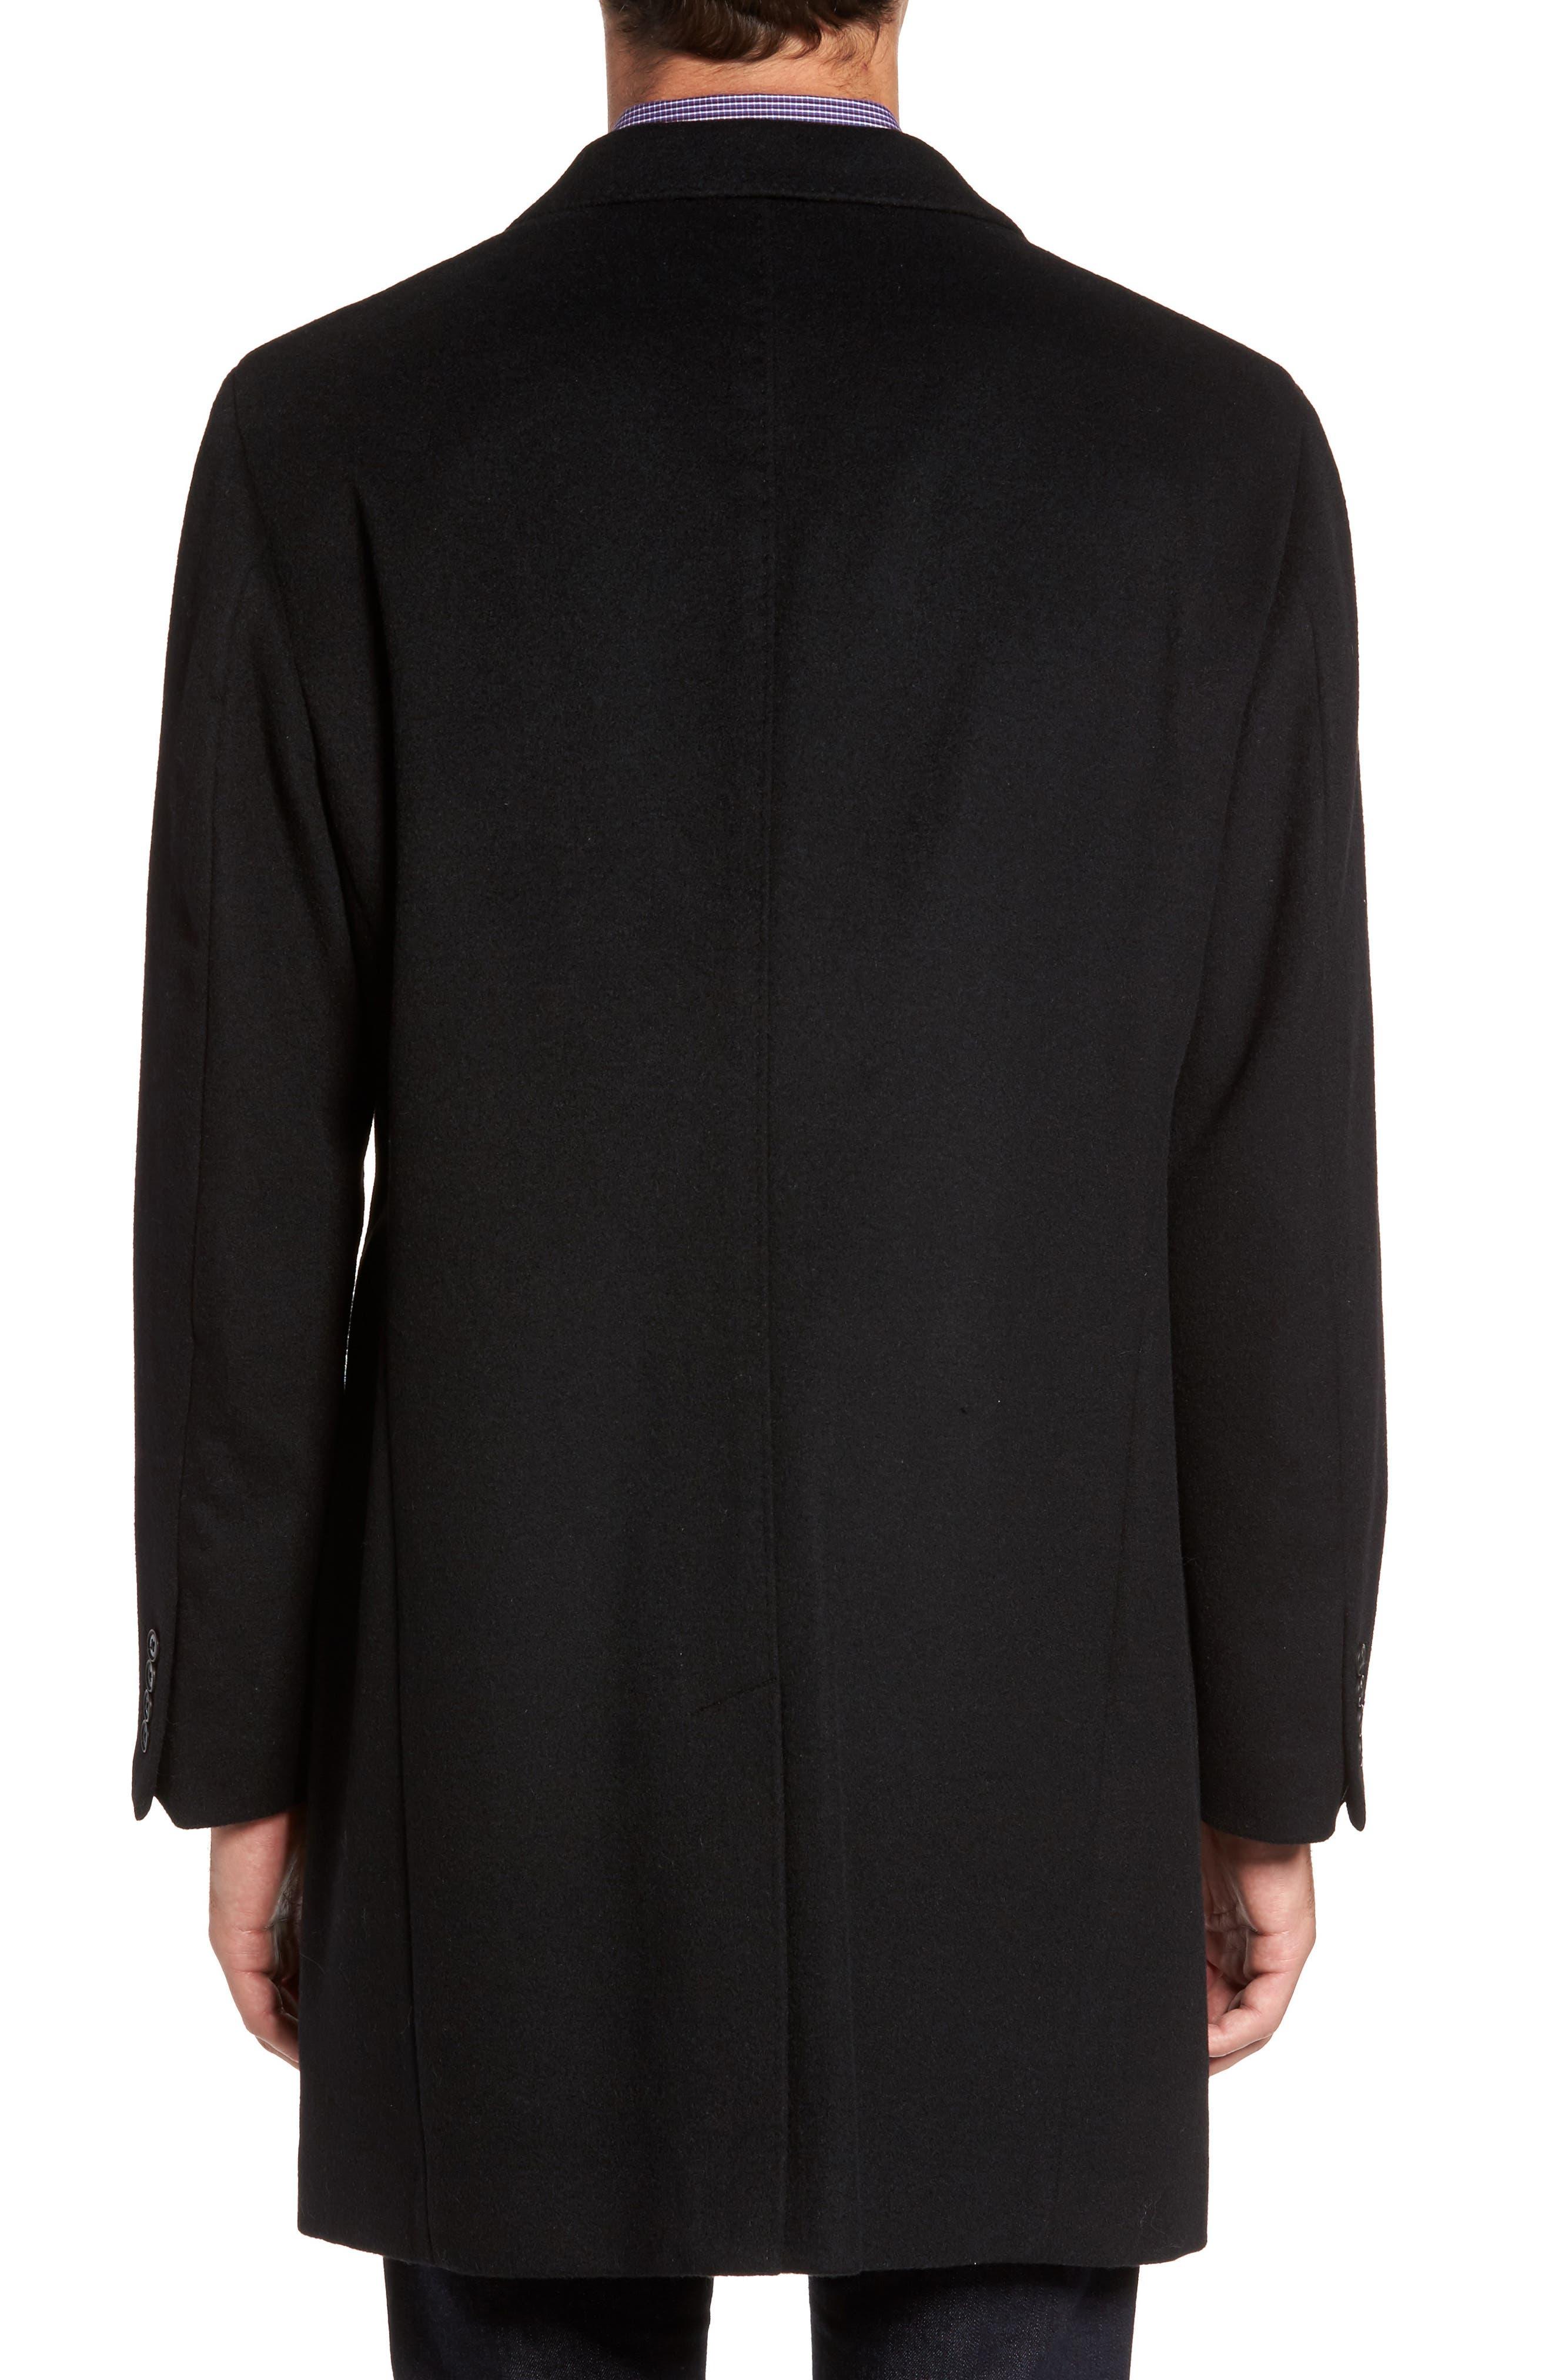 Mason Wool & Cashmere Overcoat,                             Alternate thumbnail 2, color,                             001